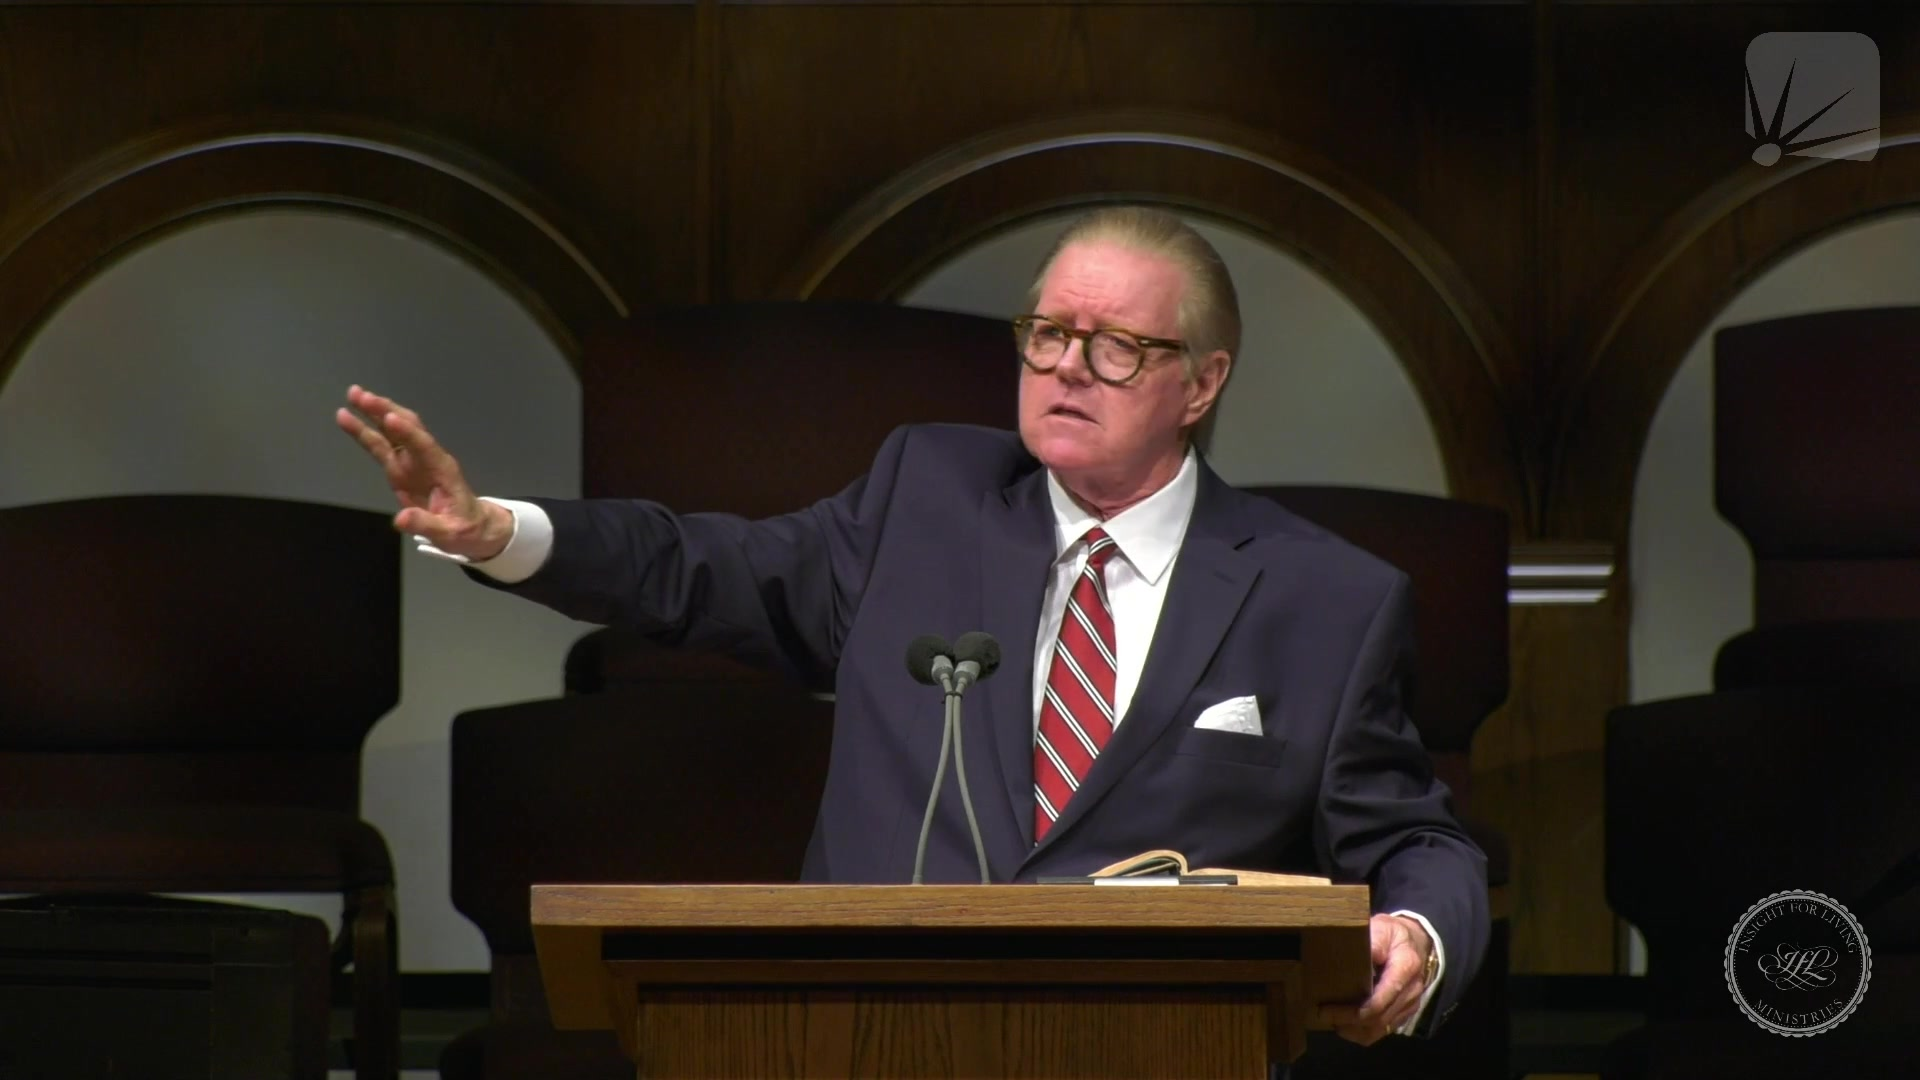 Rev. Bill Butterworth in pulpit on 20210711